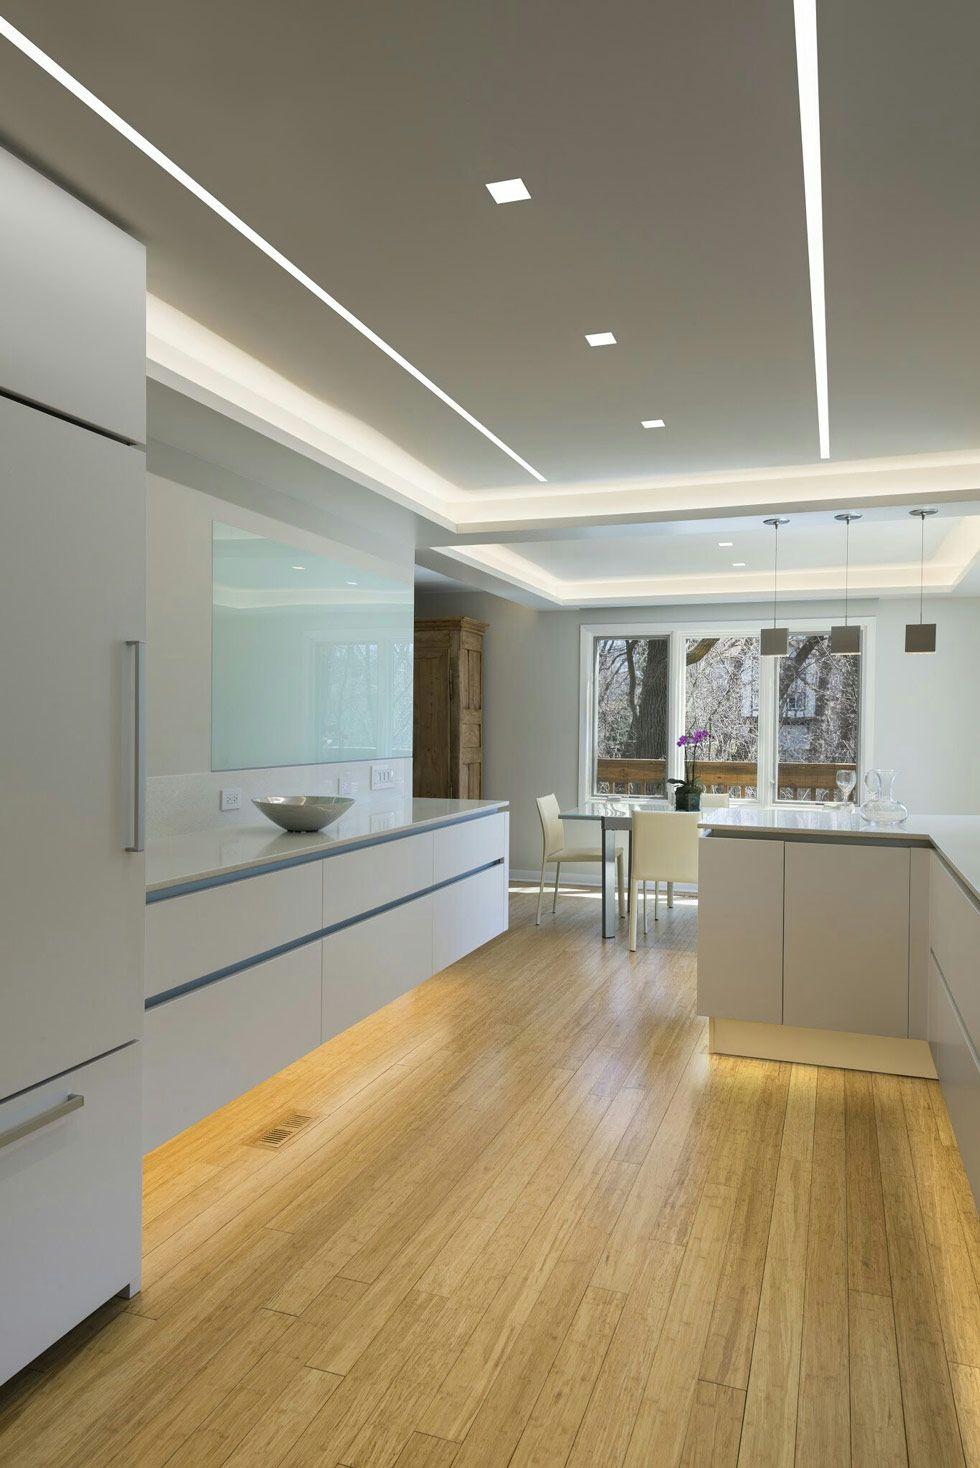 Illuminazione In Cucina Moderna.Controsoffitti In Cartongesso Guida Utile 50 Stupende